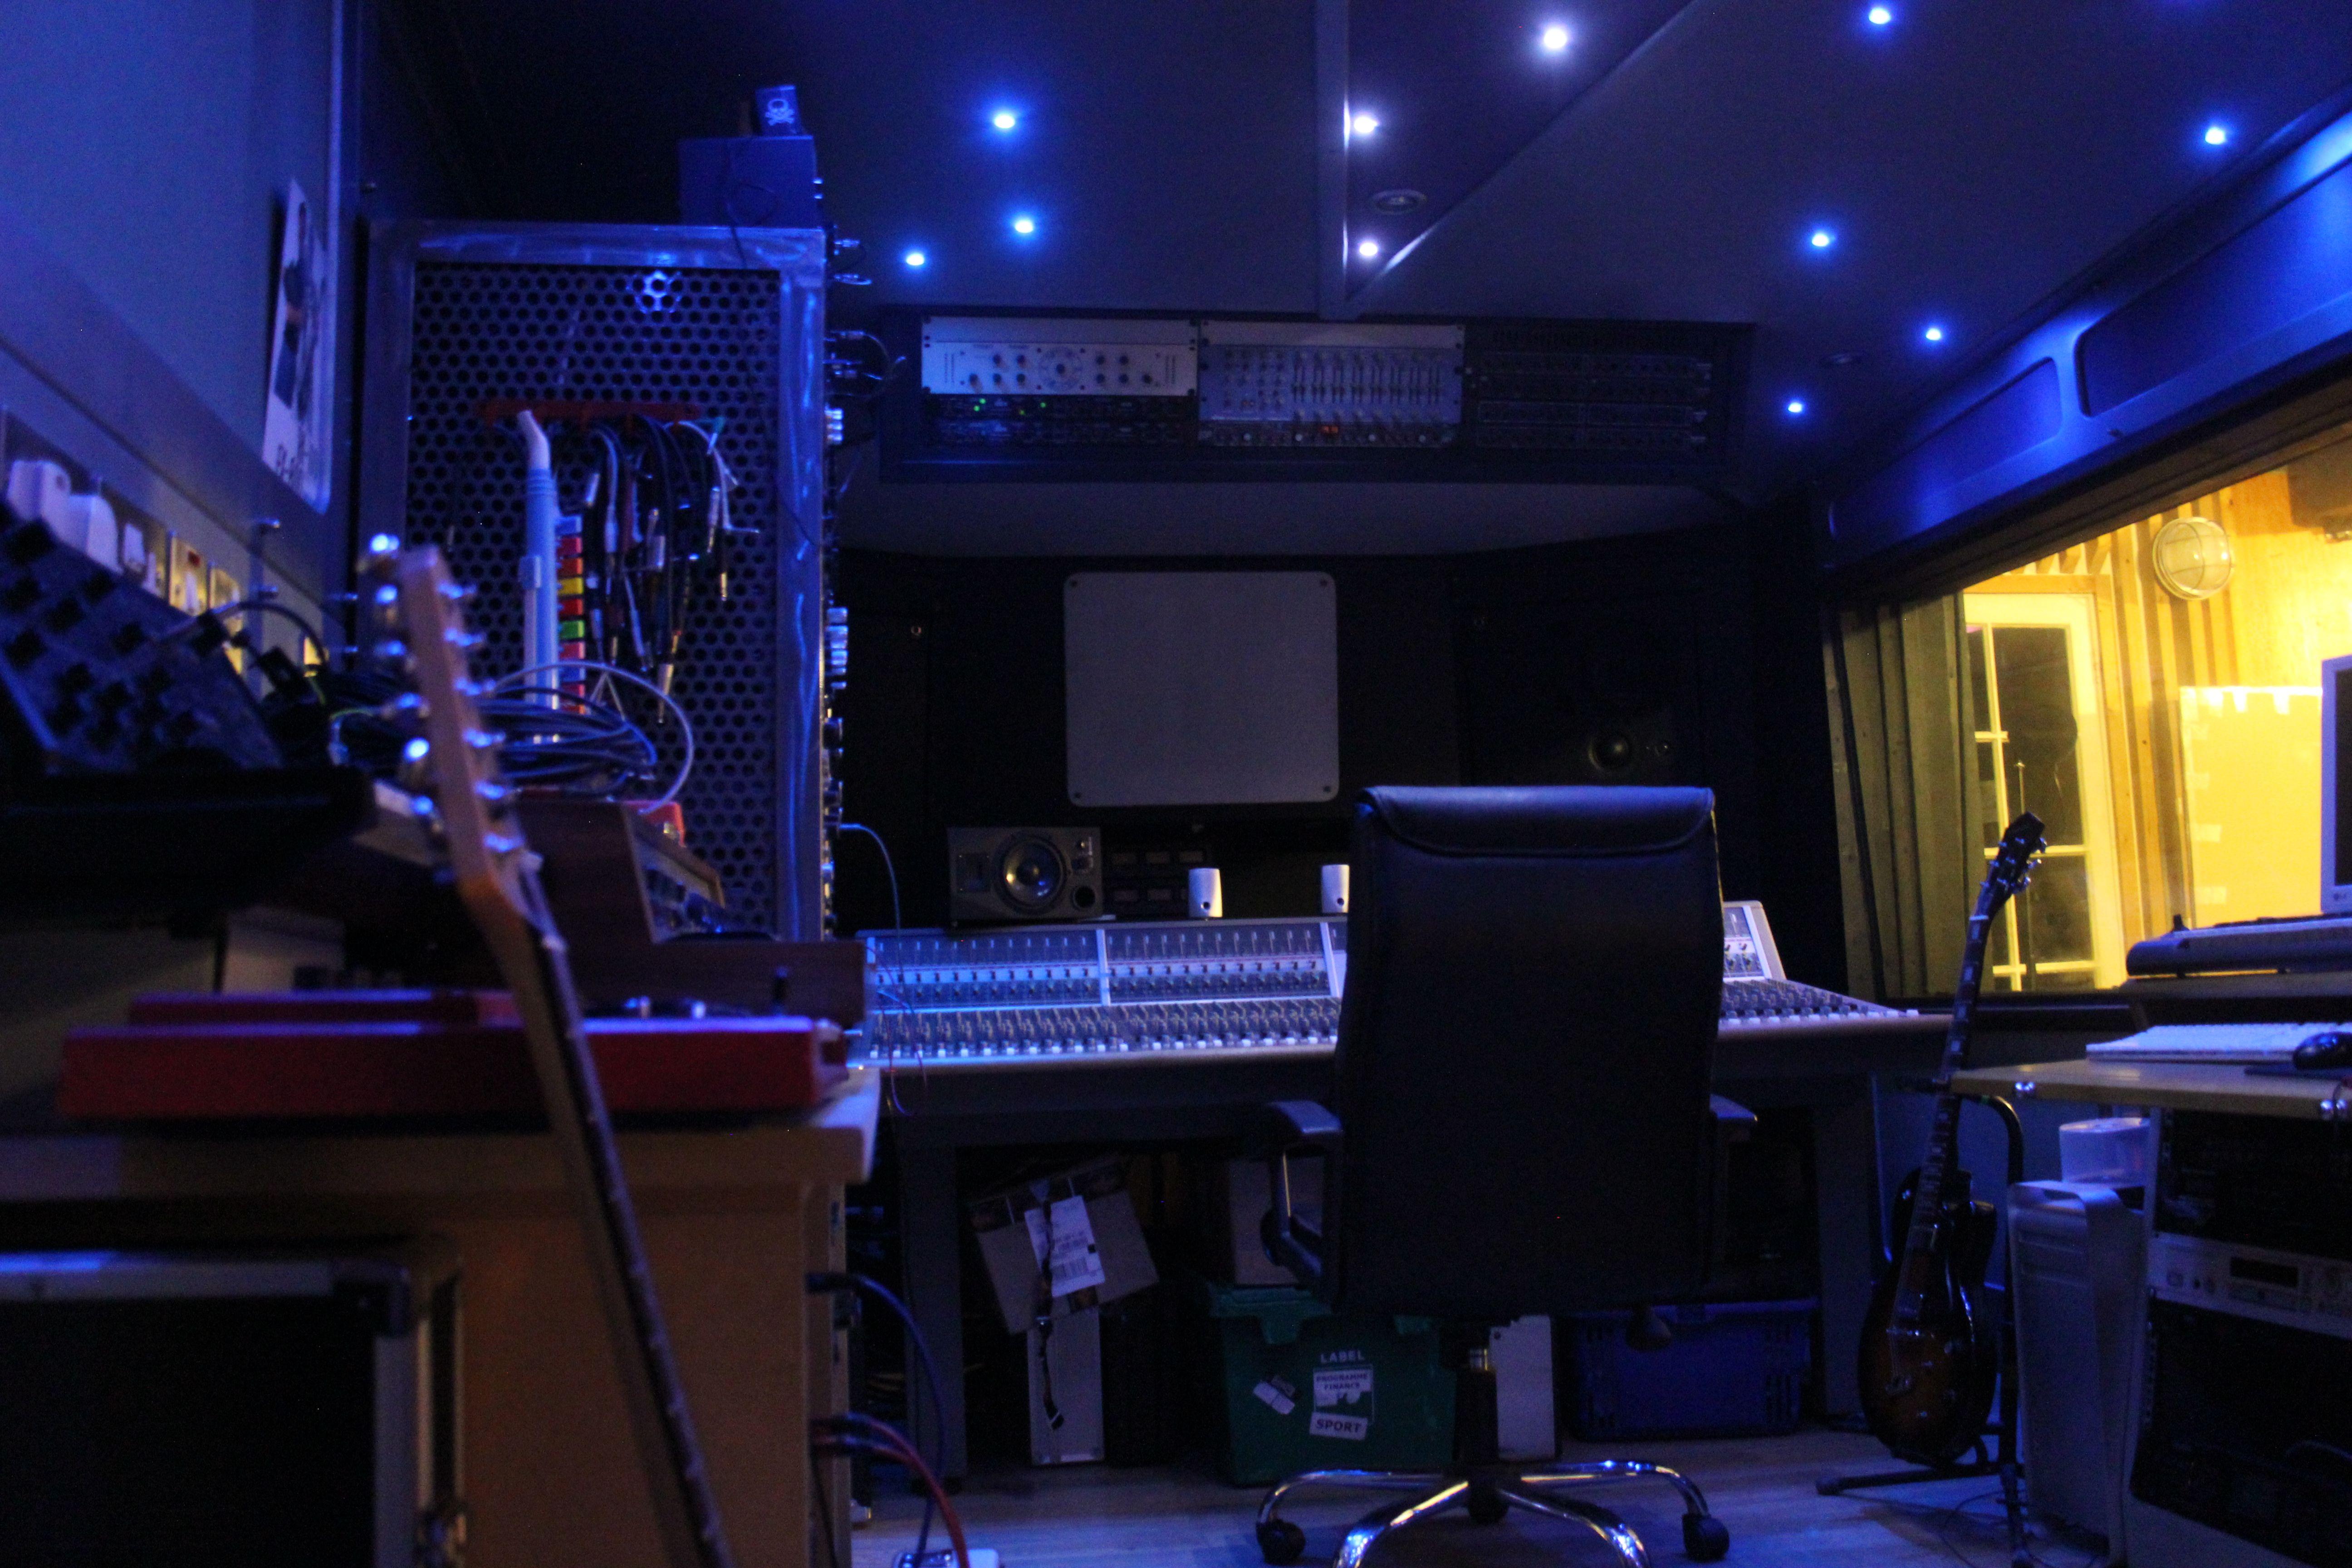 Used Studio Lighting